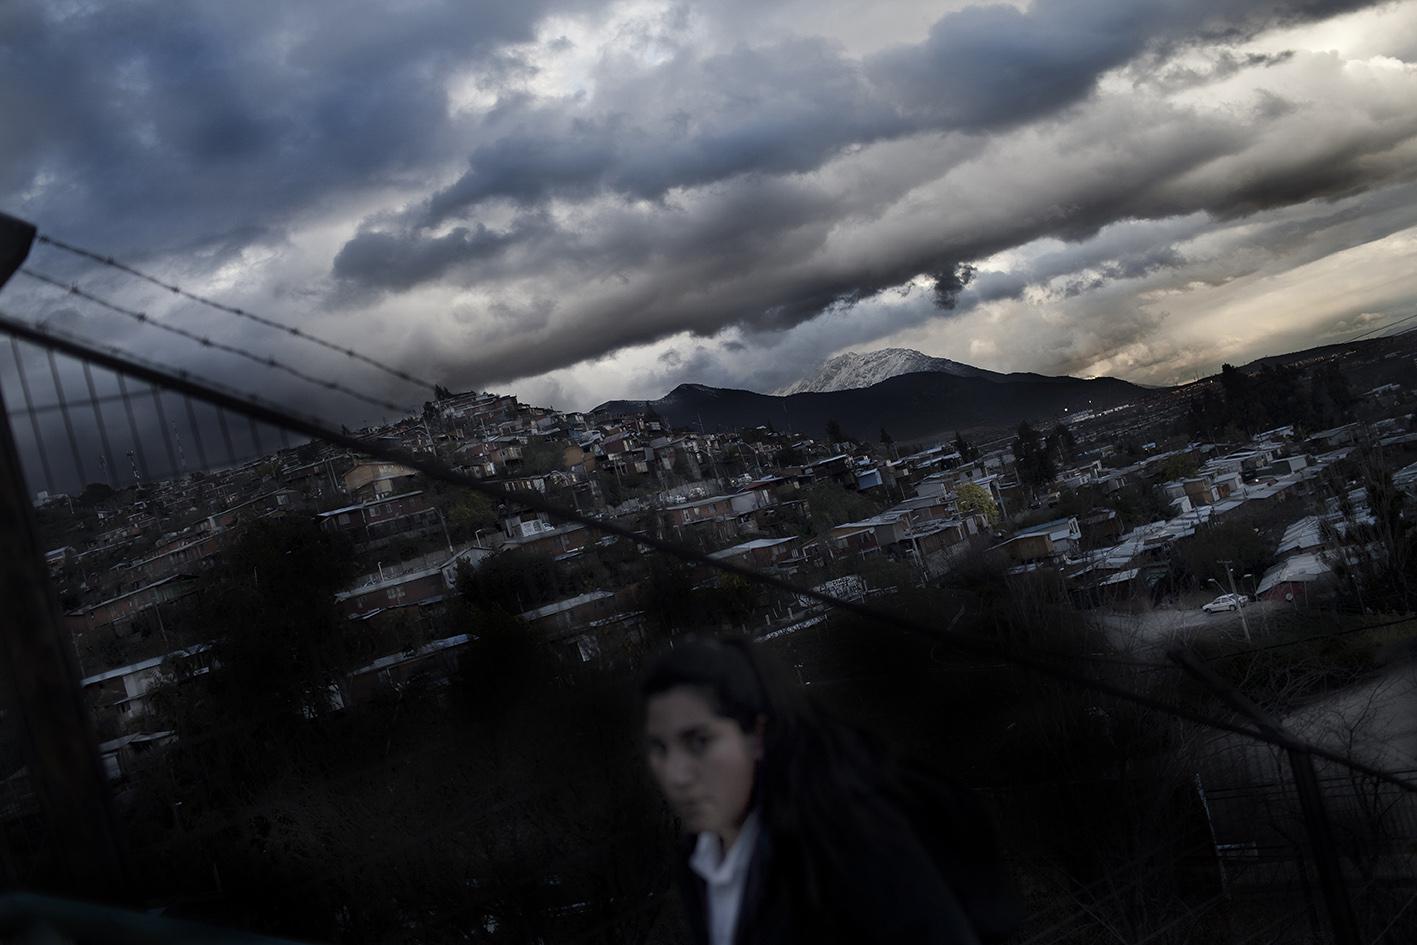 alejandro_olivares-living_periferia-1